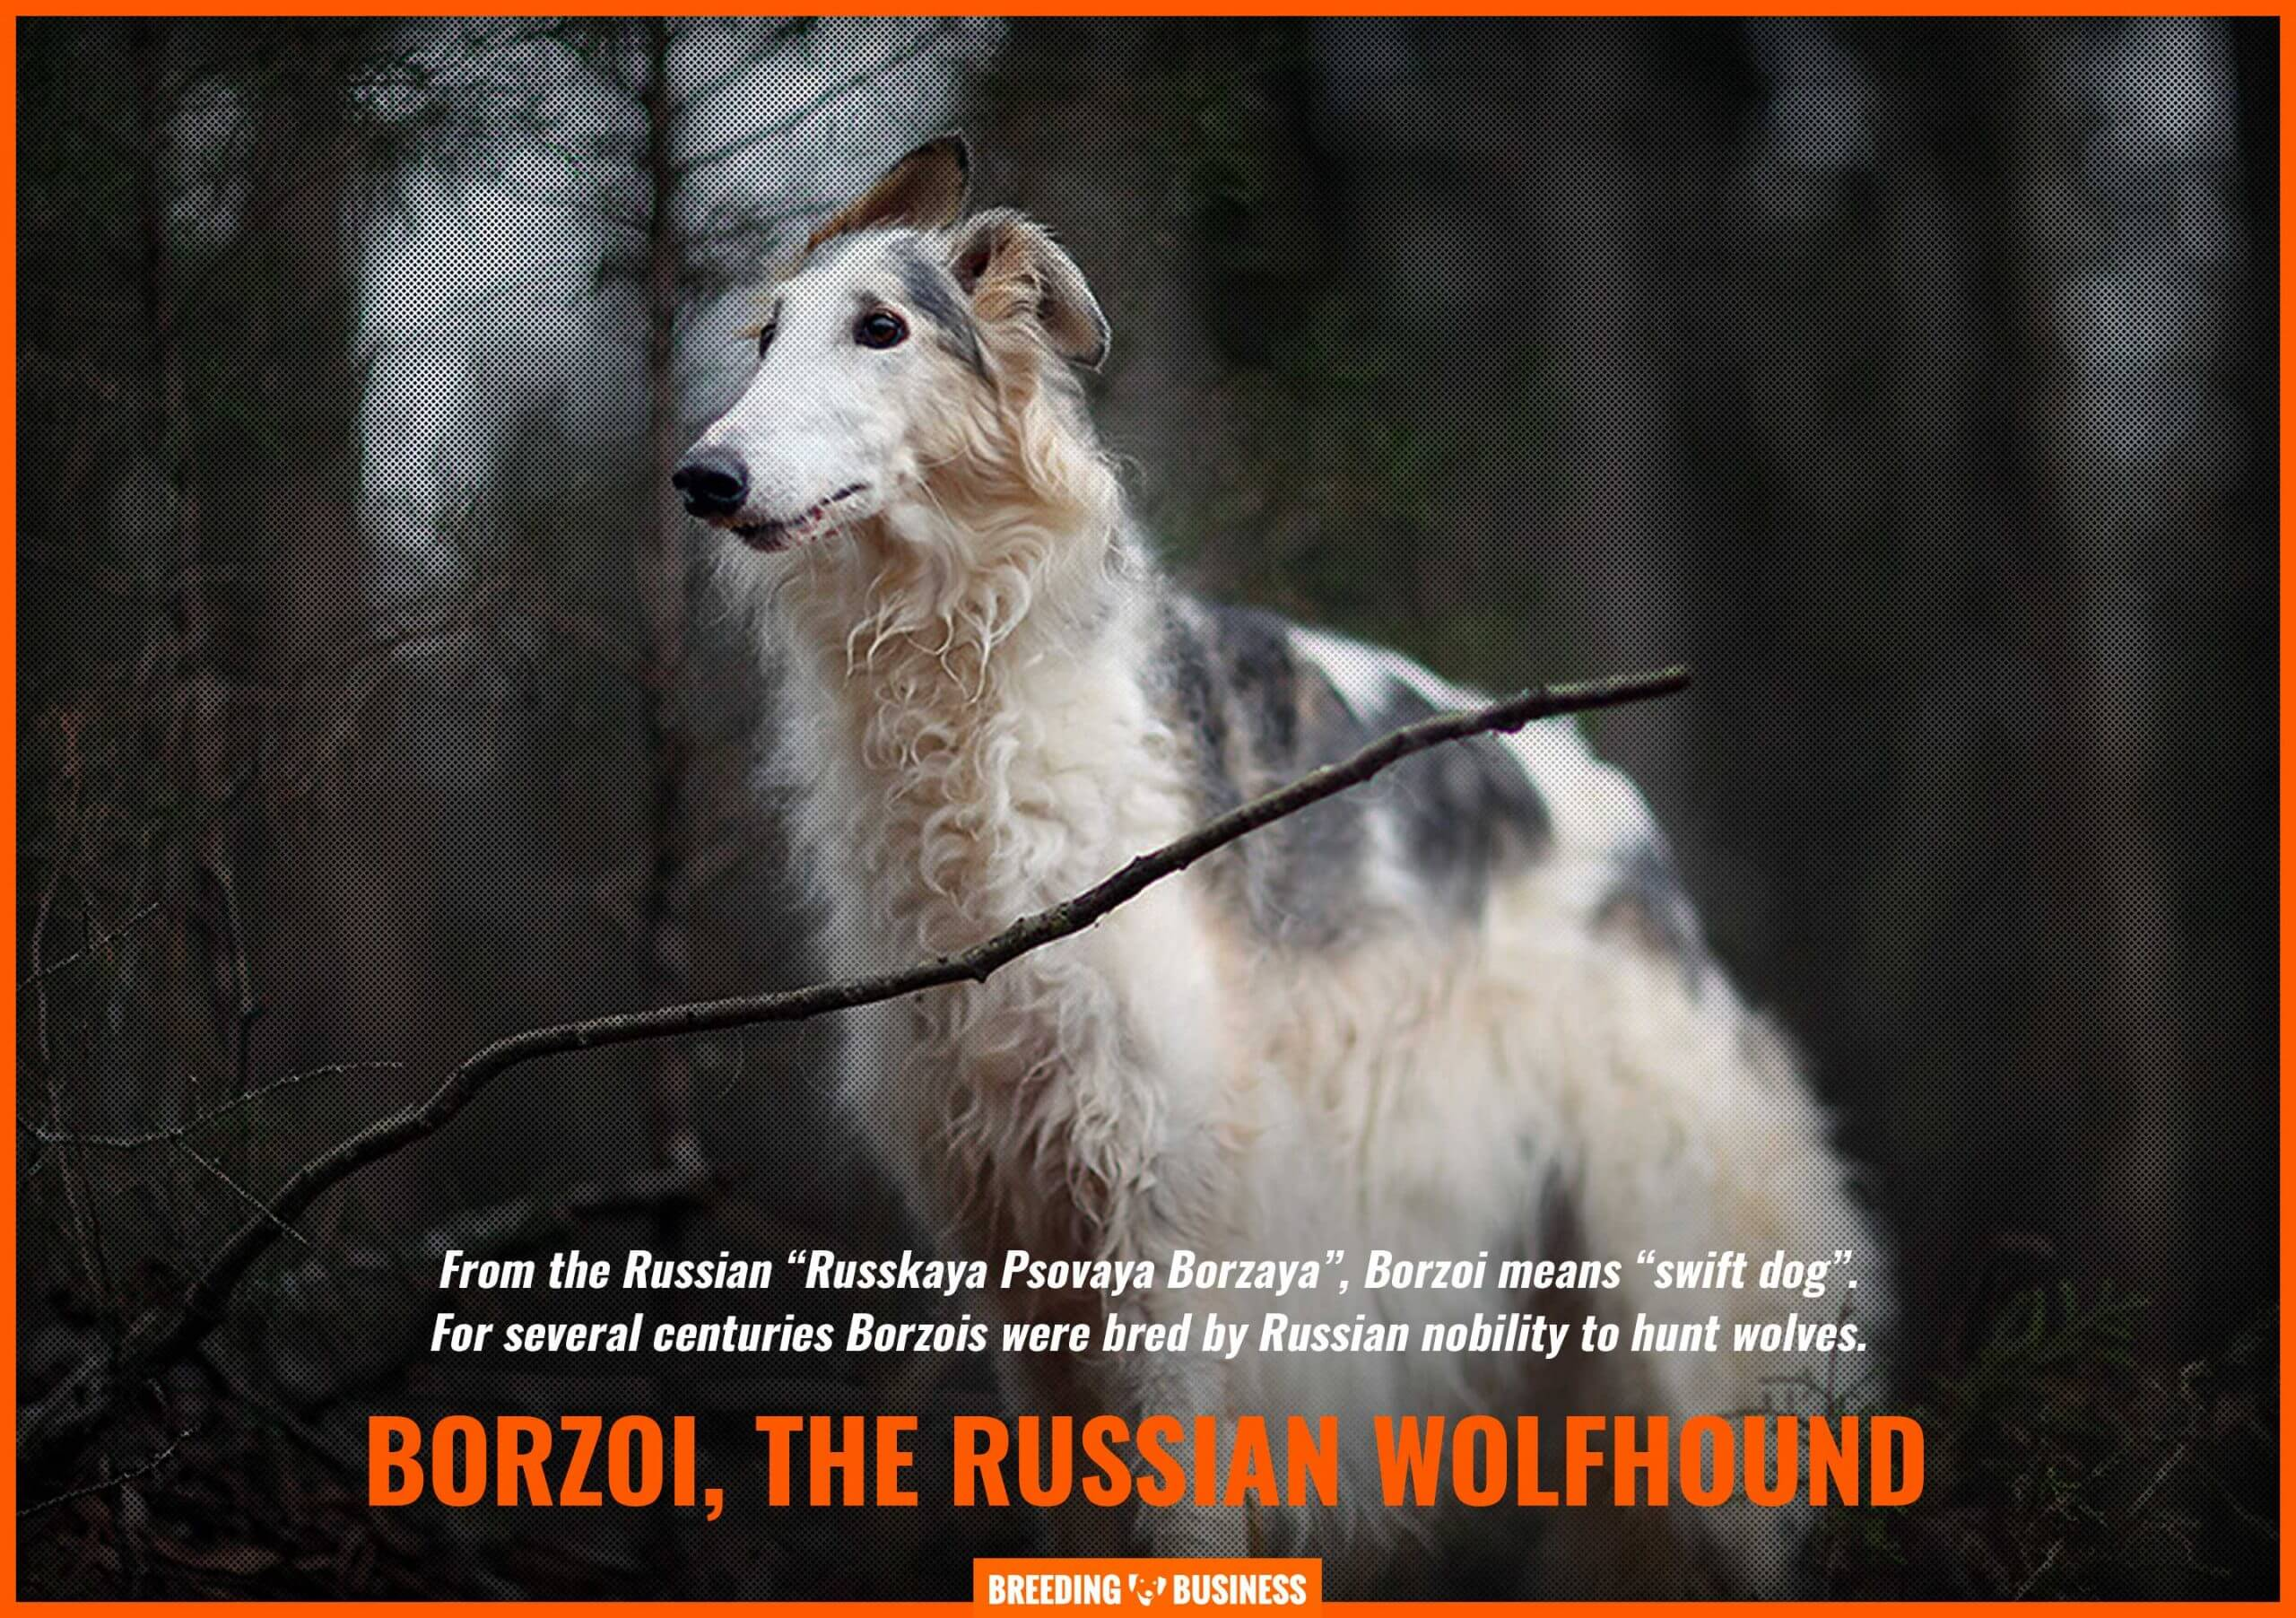 borzoi, a russian dog breed